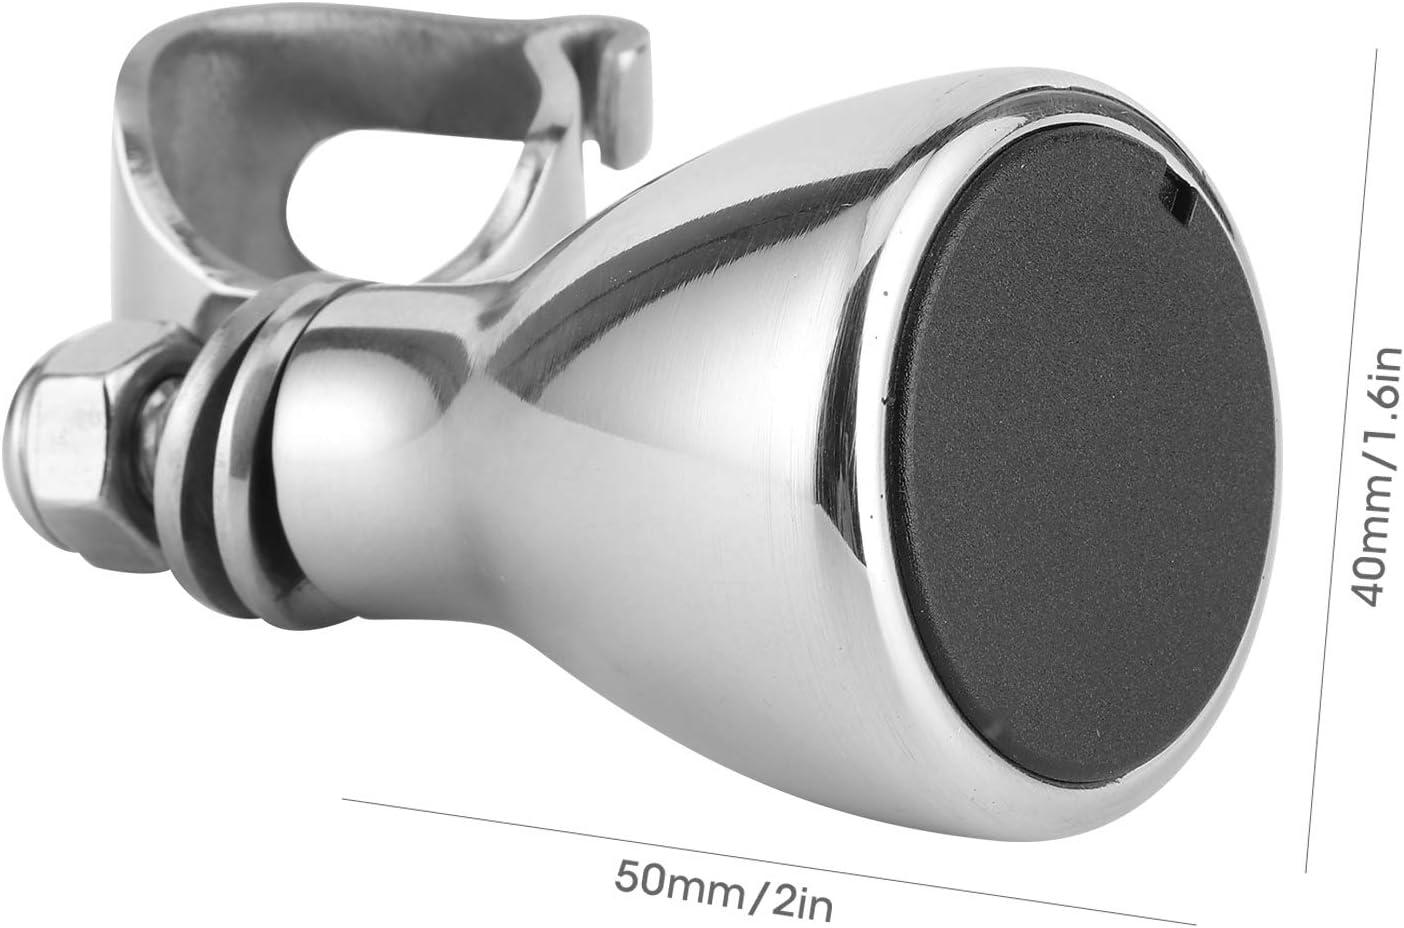 Qiilu Chromate Aluminum Alloy Steering Wheel Spinner Knob Handle for Marine Boat Yacht Boat Steering Wheel Spinner